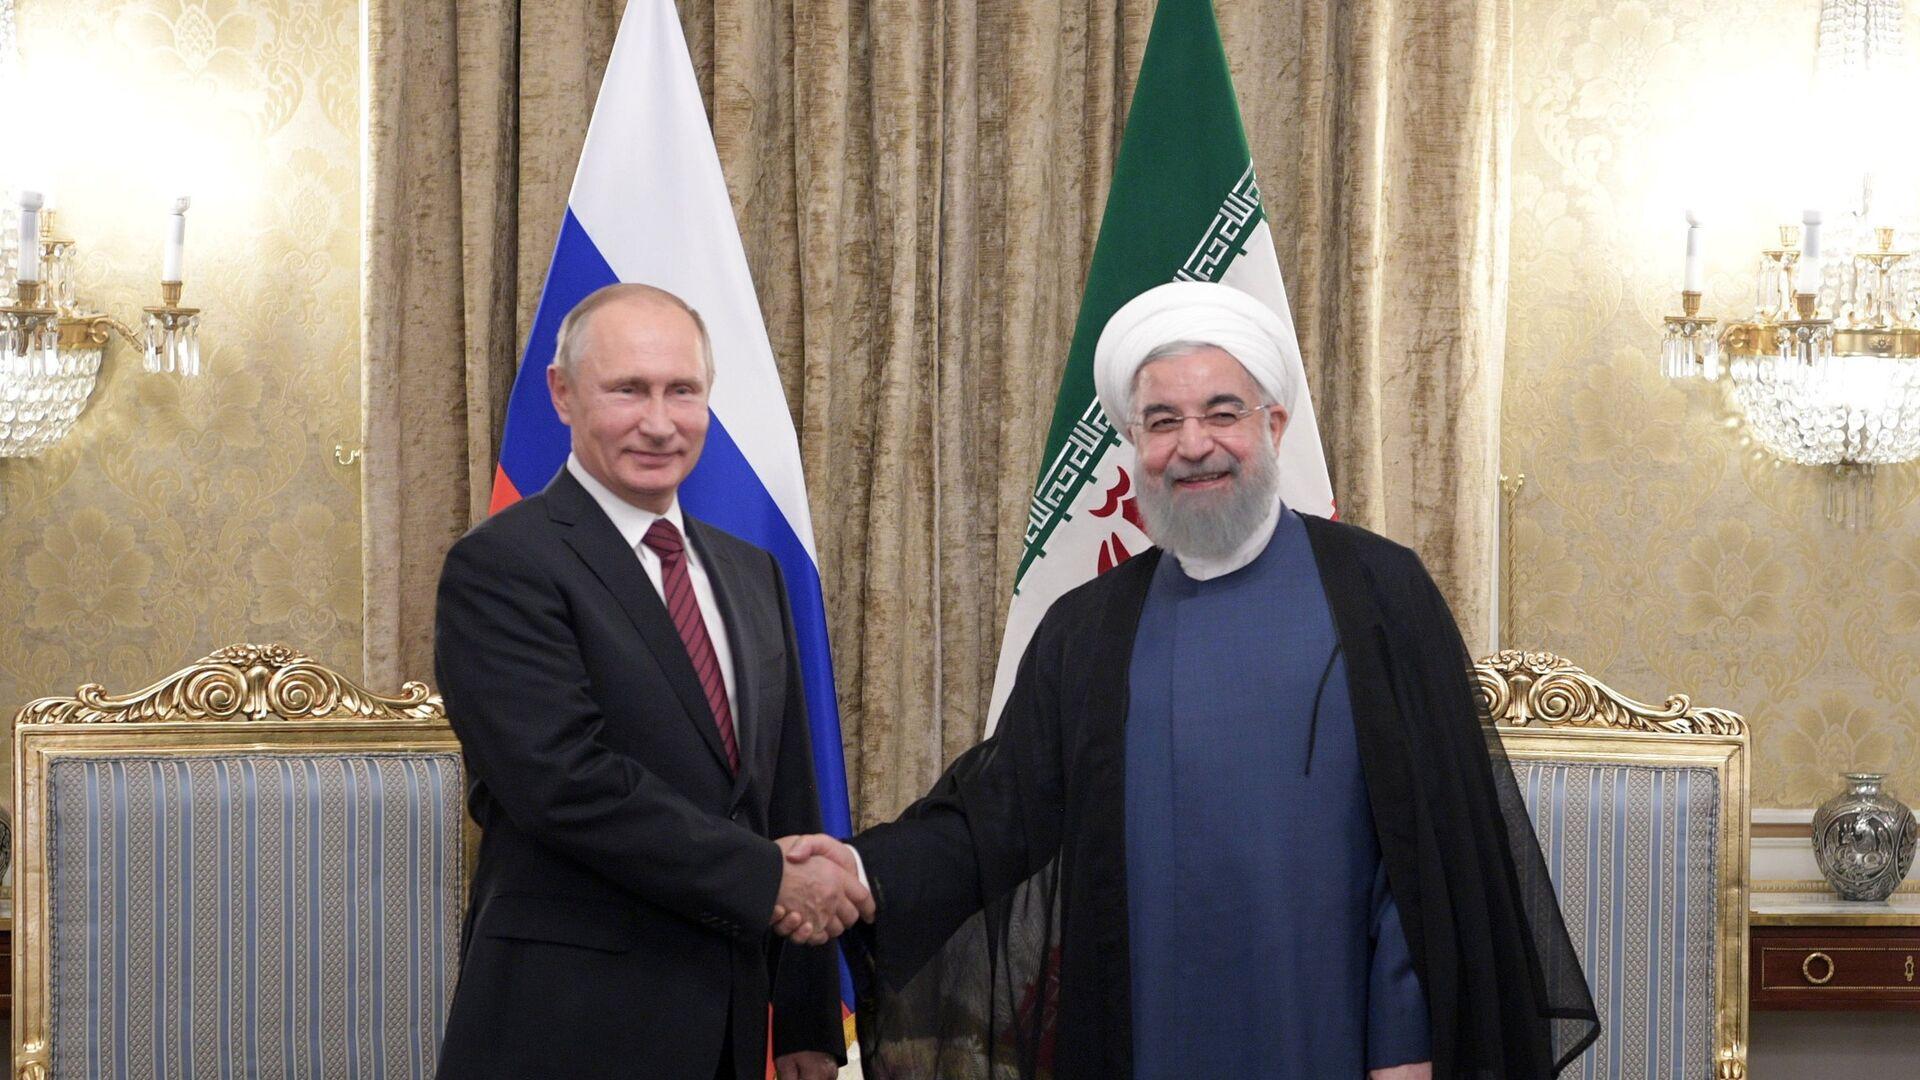 Presindente de Rusia, Vladímir Putin y presidente de Irán, Hasán Rohaní (archivo) - Sputnik Mundo, 1920, 12.03.2021